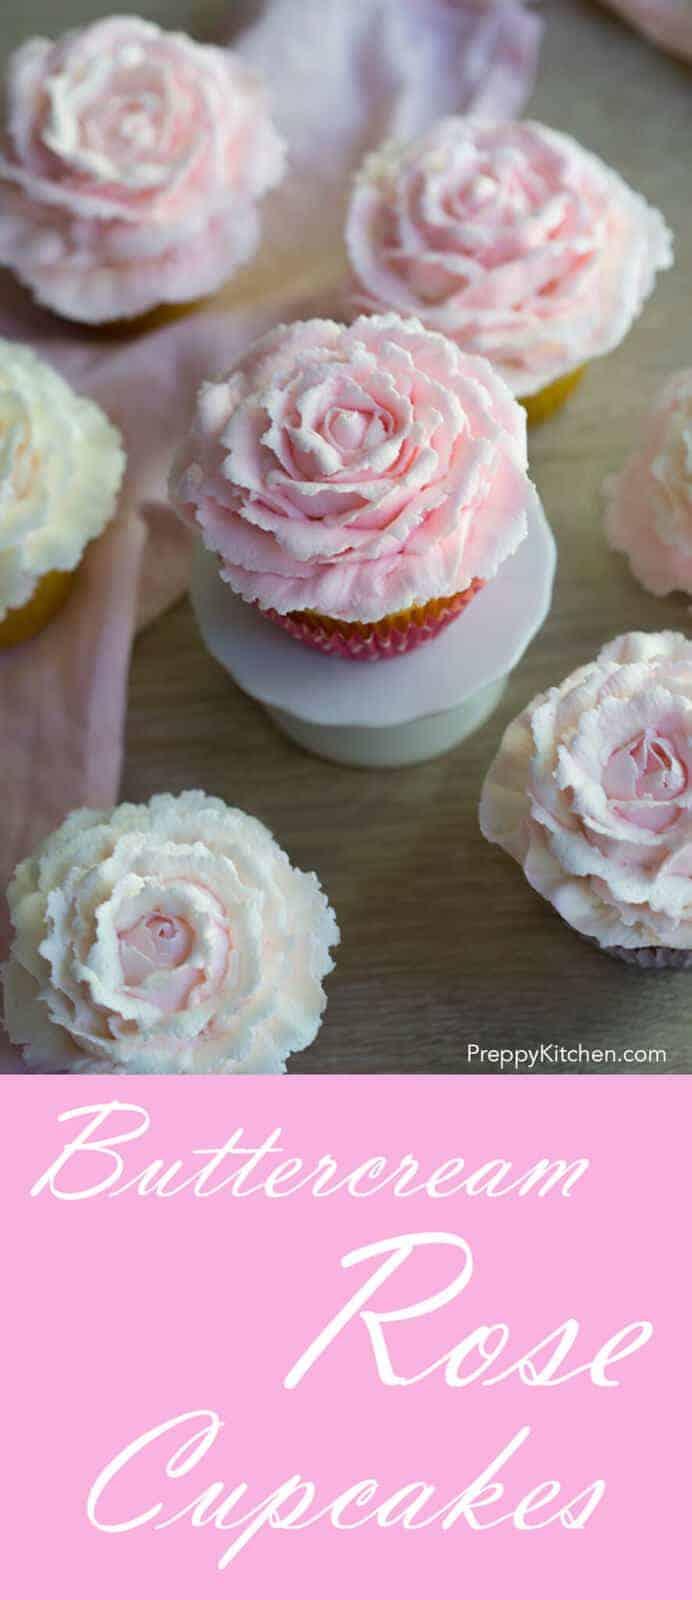 Beautiful buttercream roses top a moist vanilla cupcake.